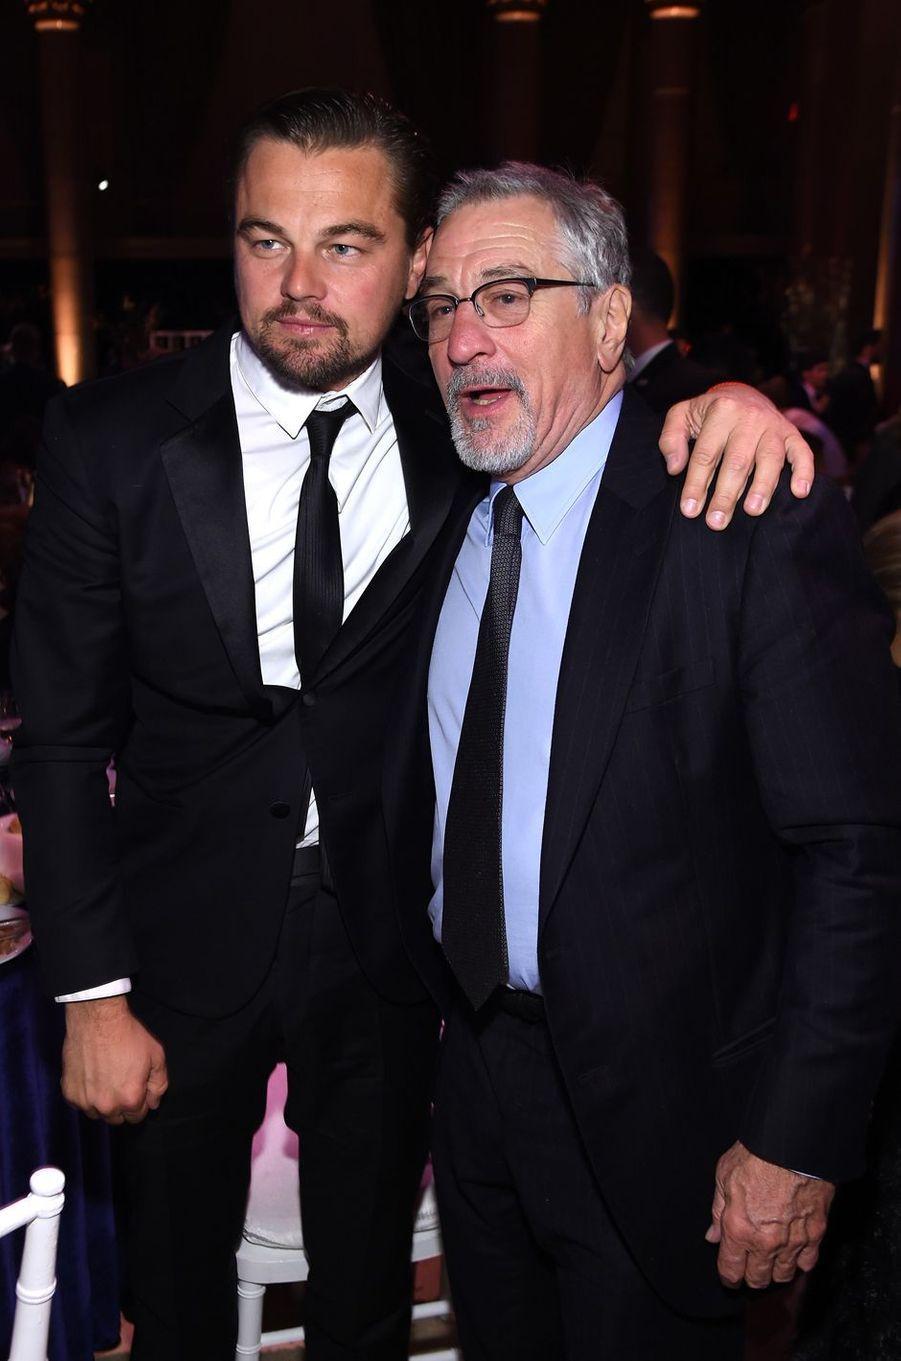 Leonardo DiCaprio et Robert de Niro à New York le 10 février 2016